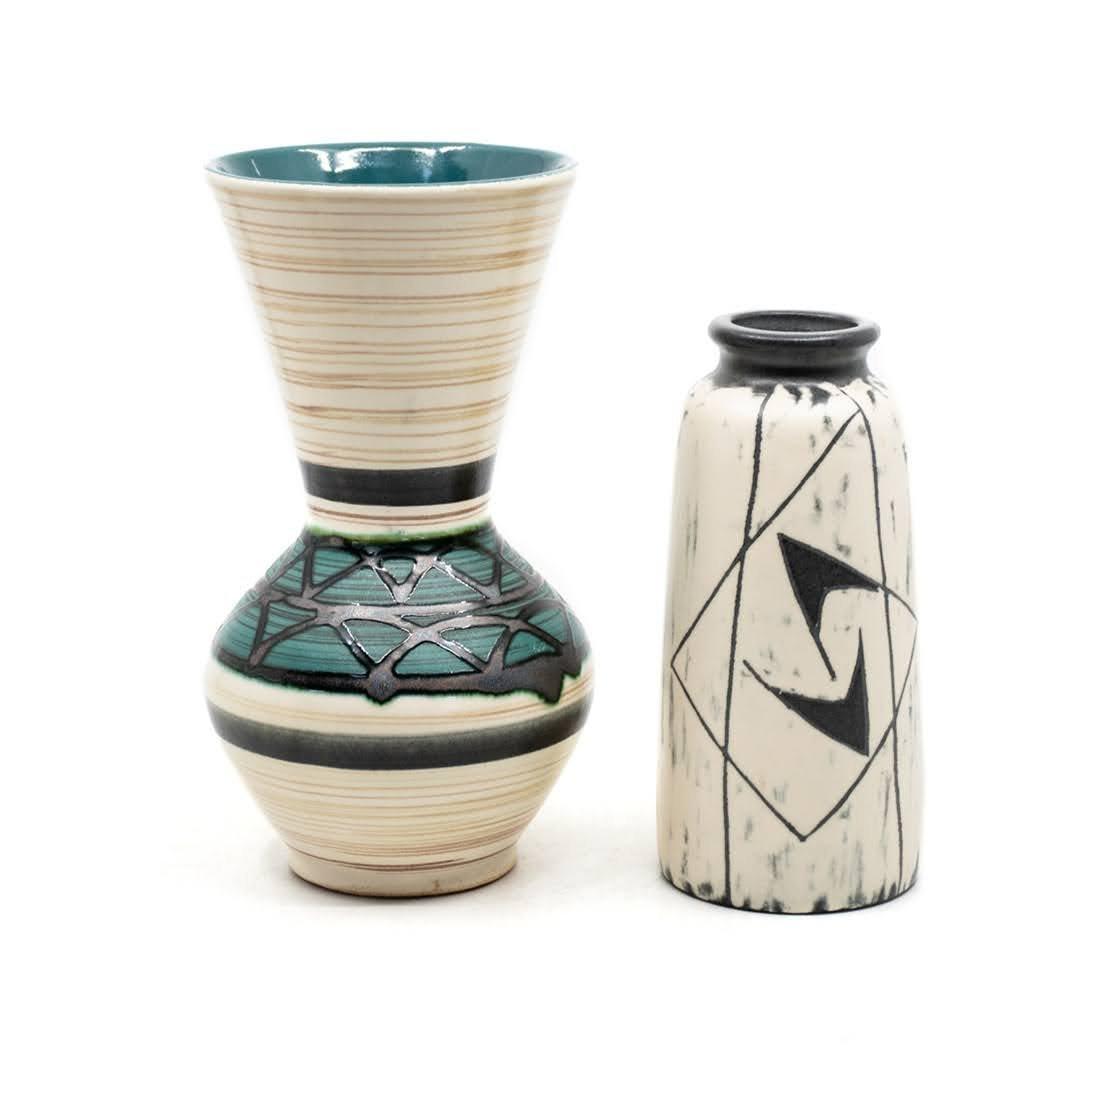 Carstens-Tonnieshof 664-18 and Danmark Vases